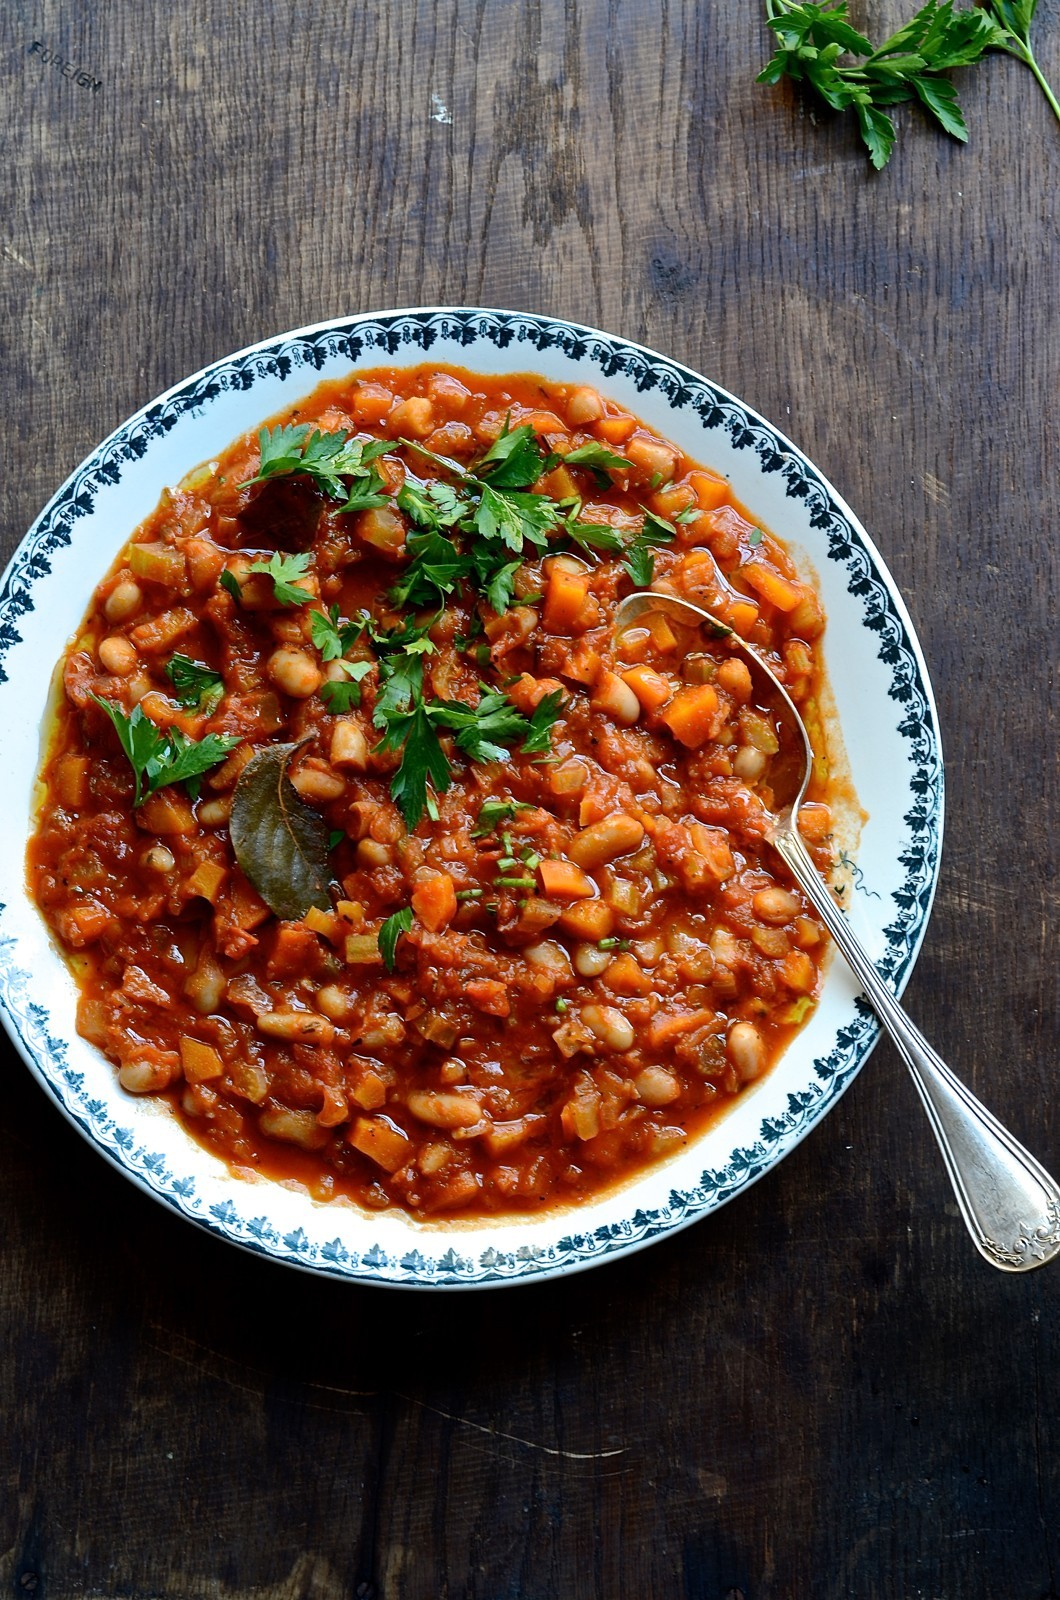 Fennel and cannellini bean stew | Bibbyskitchen recipes | Vegan recipes |